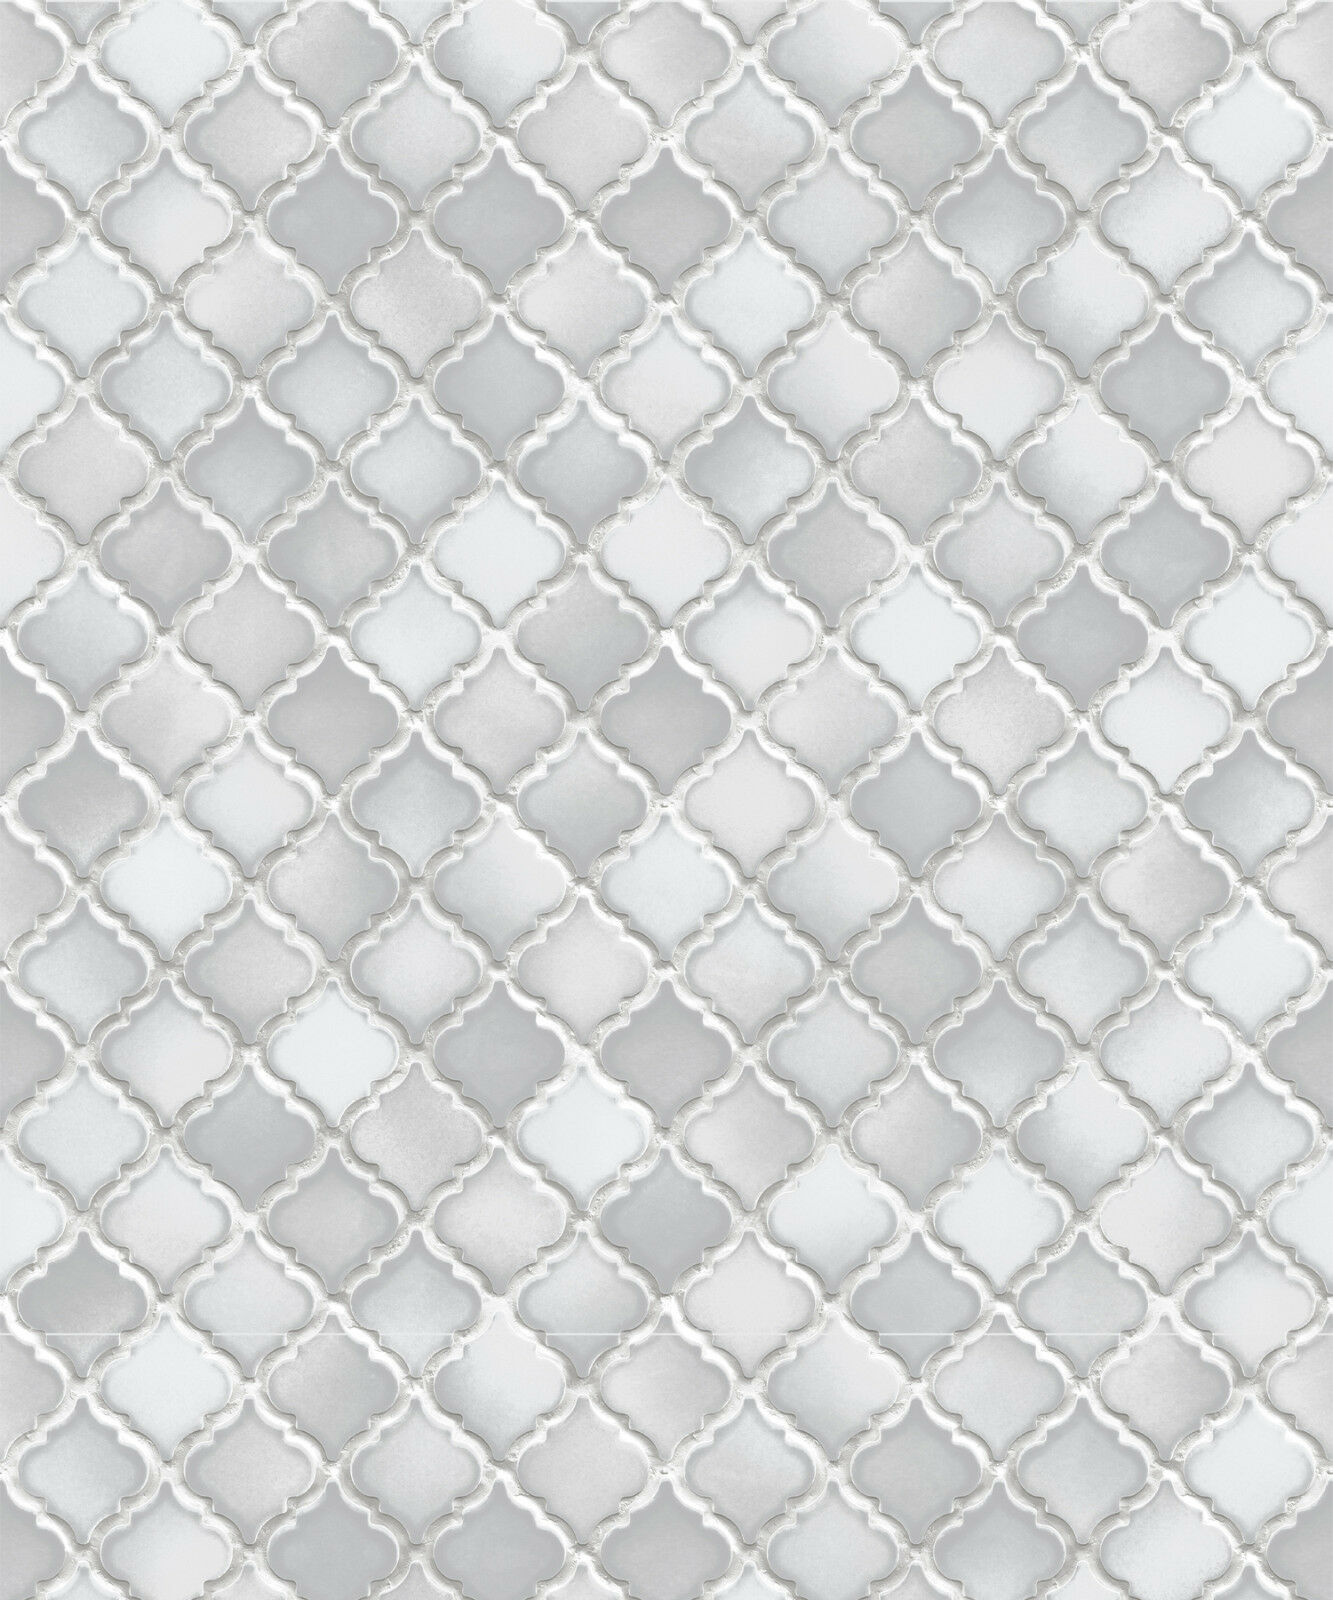 Vlies Tapete Stein Keramik Mosaik Fliesen Florentiner Optik Grau - Florentiner fliesen